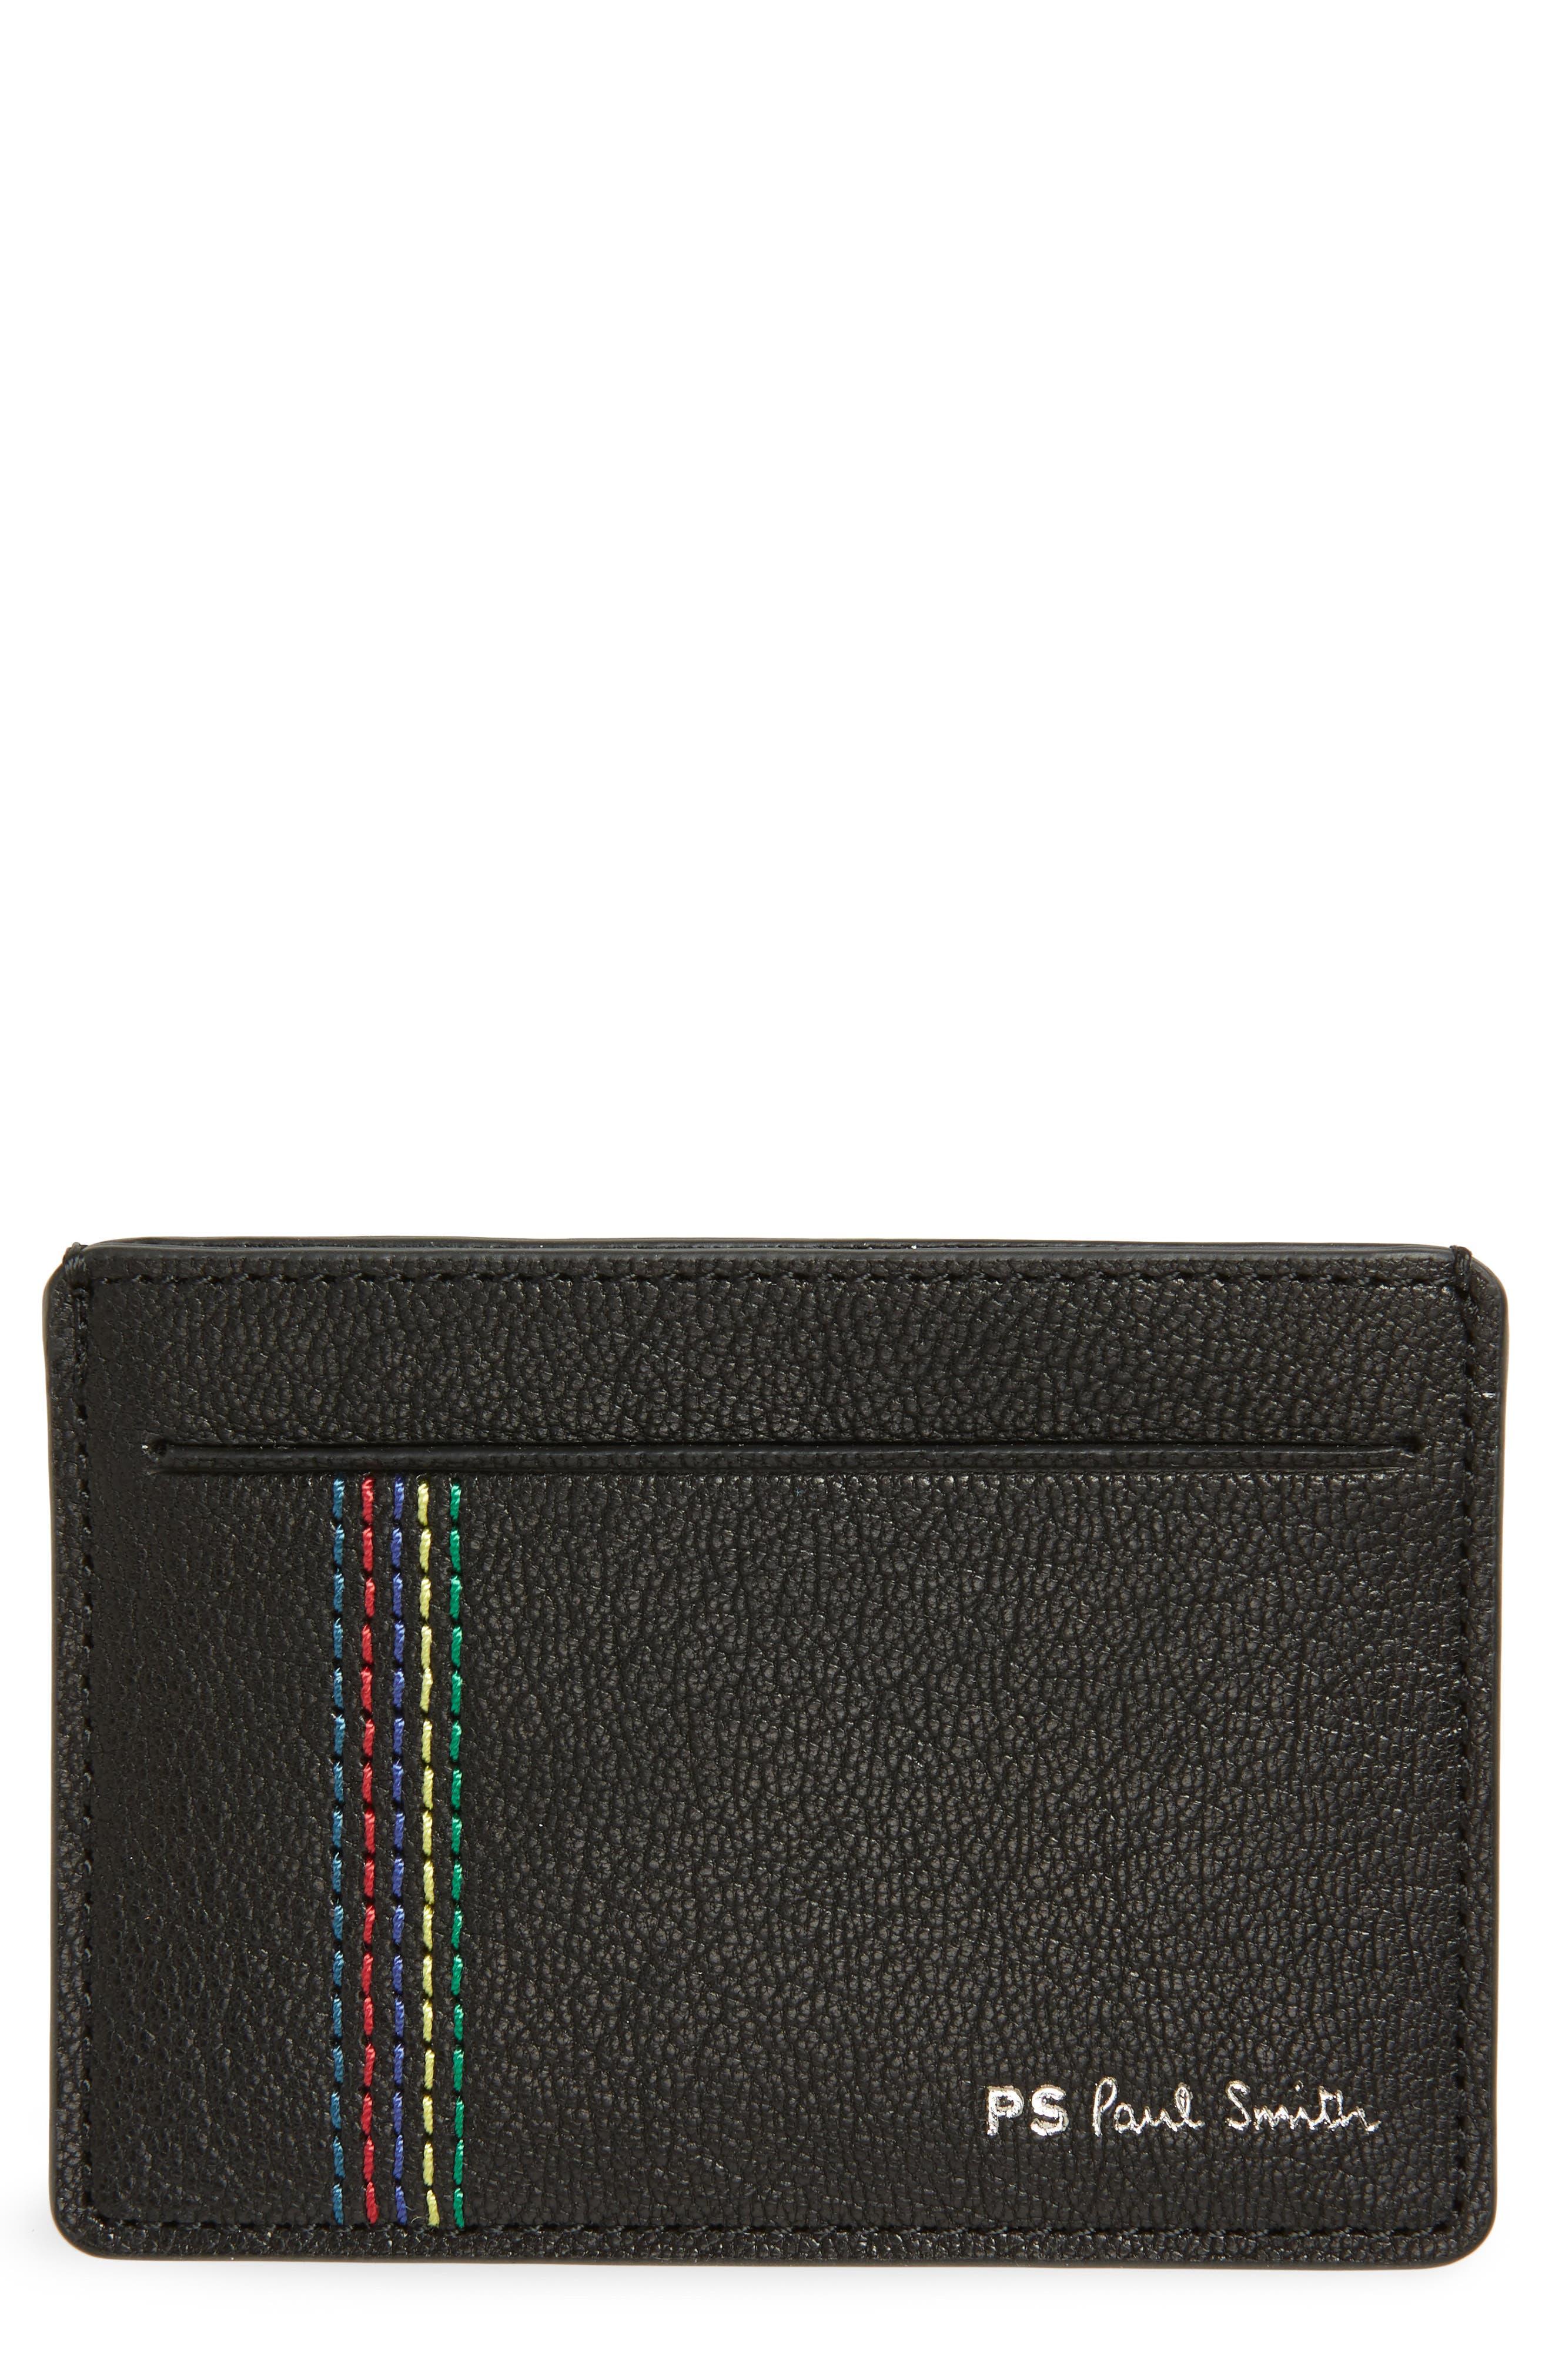 PAUL SMITH,                             Leather Card Case,                             Main thumbnail 1, color,                             001